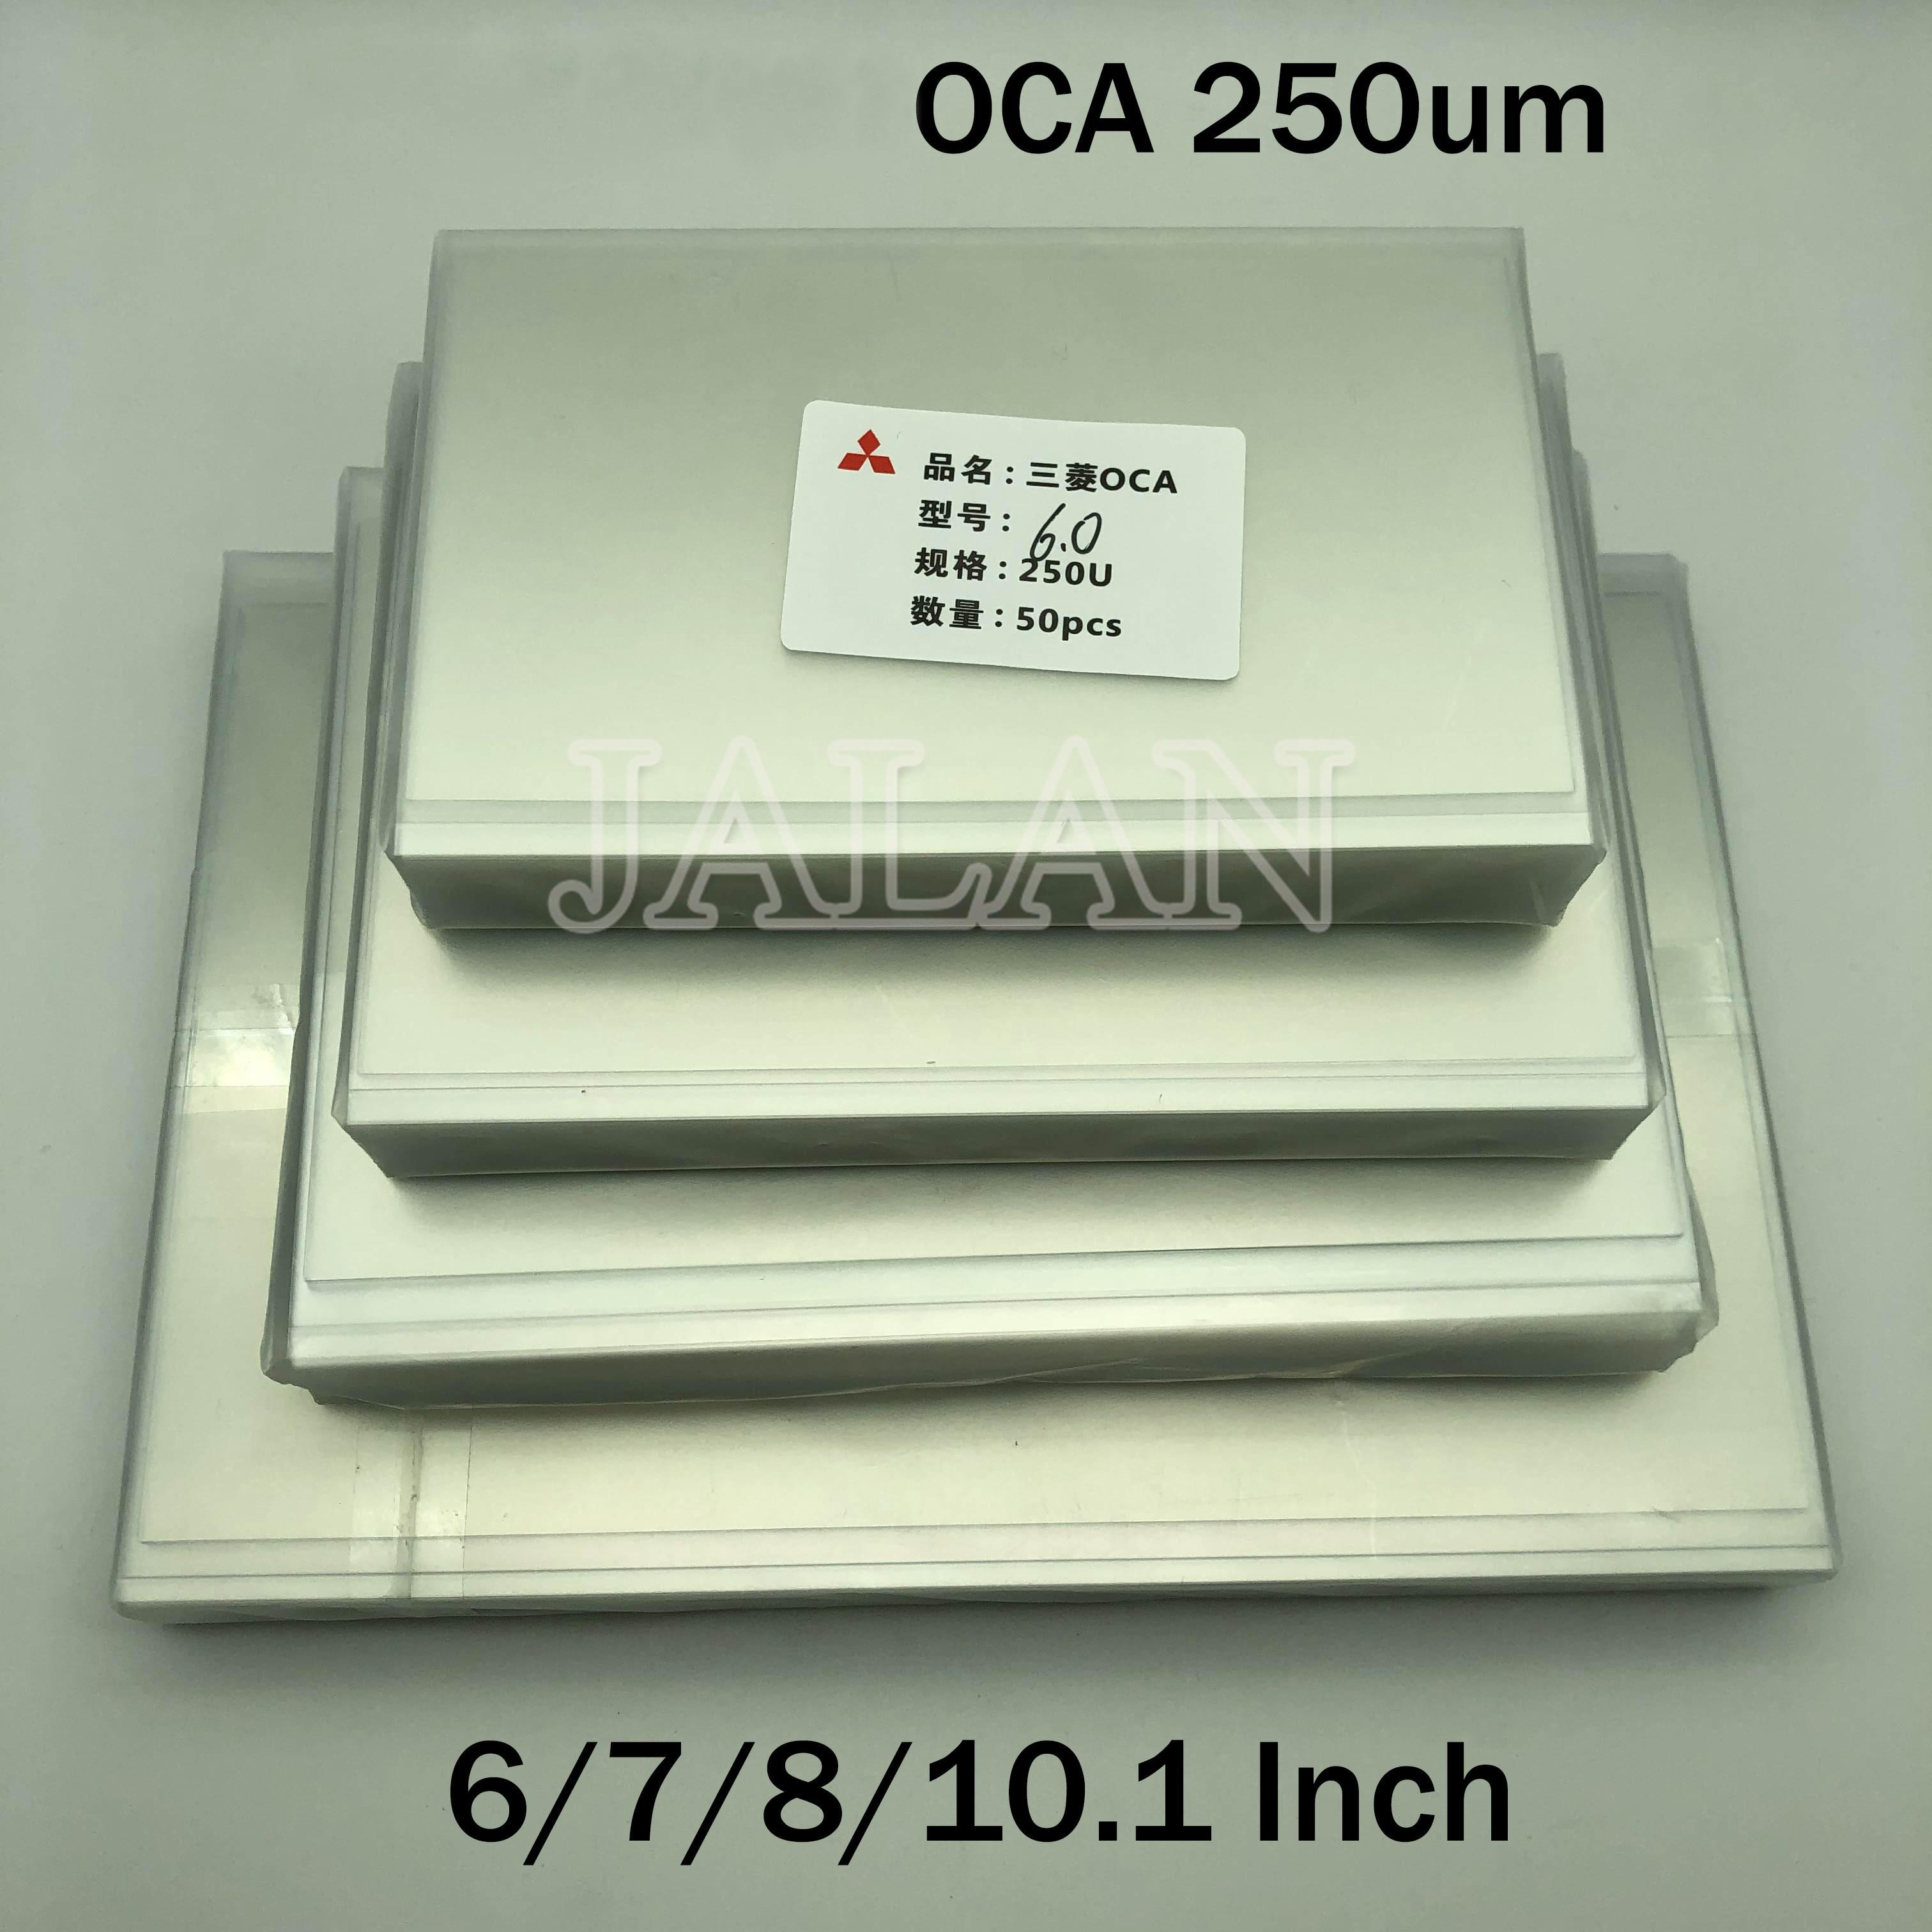 250um OCA Glue For Ip 6/7/7.9/8/9.7/10.1/12.9/15.6 Inch Touch Screen Glass Oca Laminating Lcd Repair For Mitsubishi Oca Adhesive